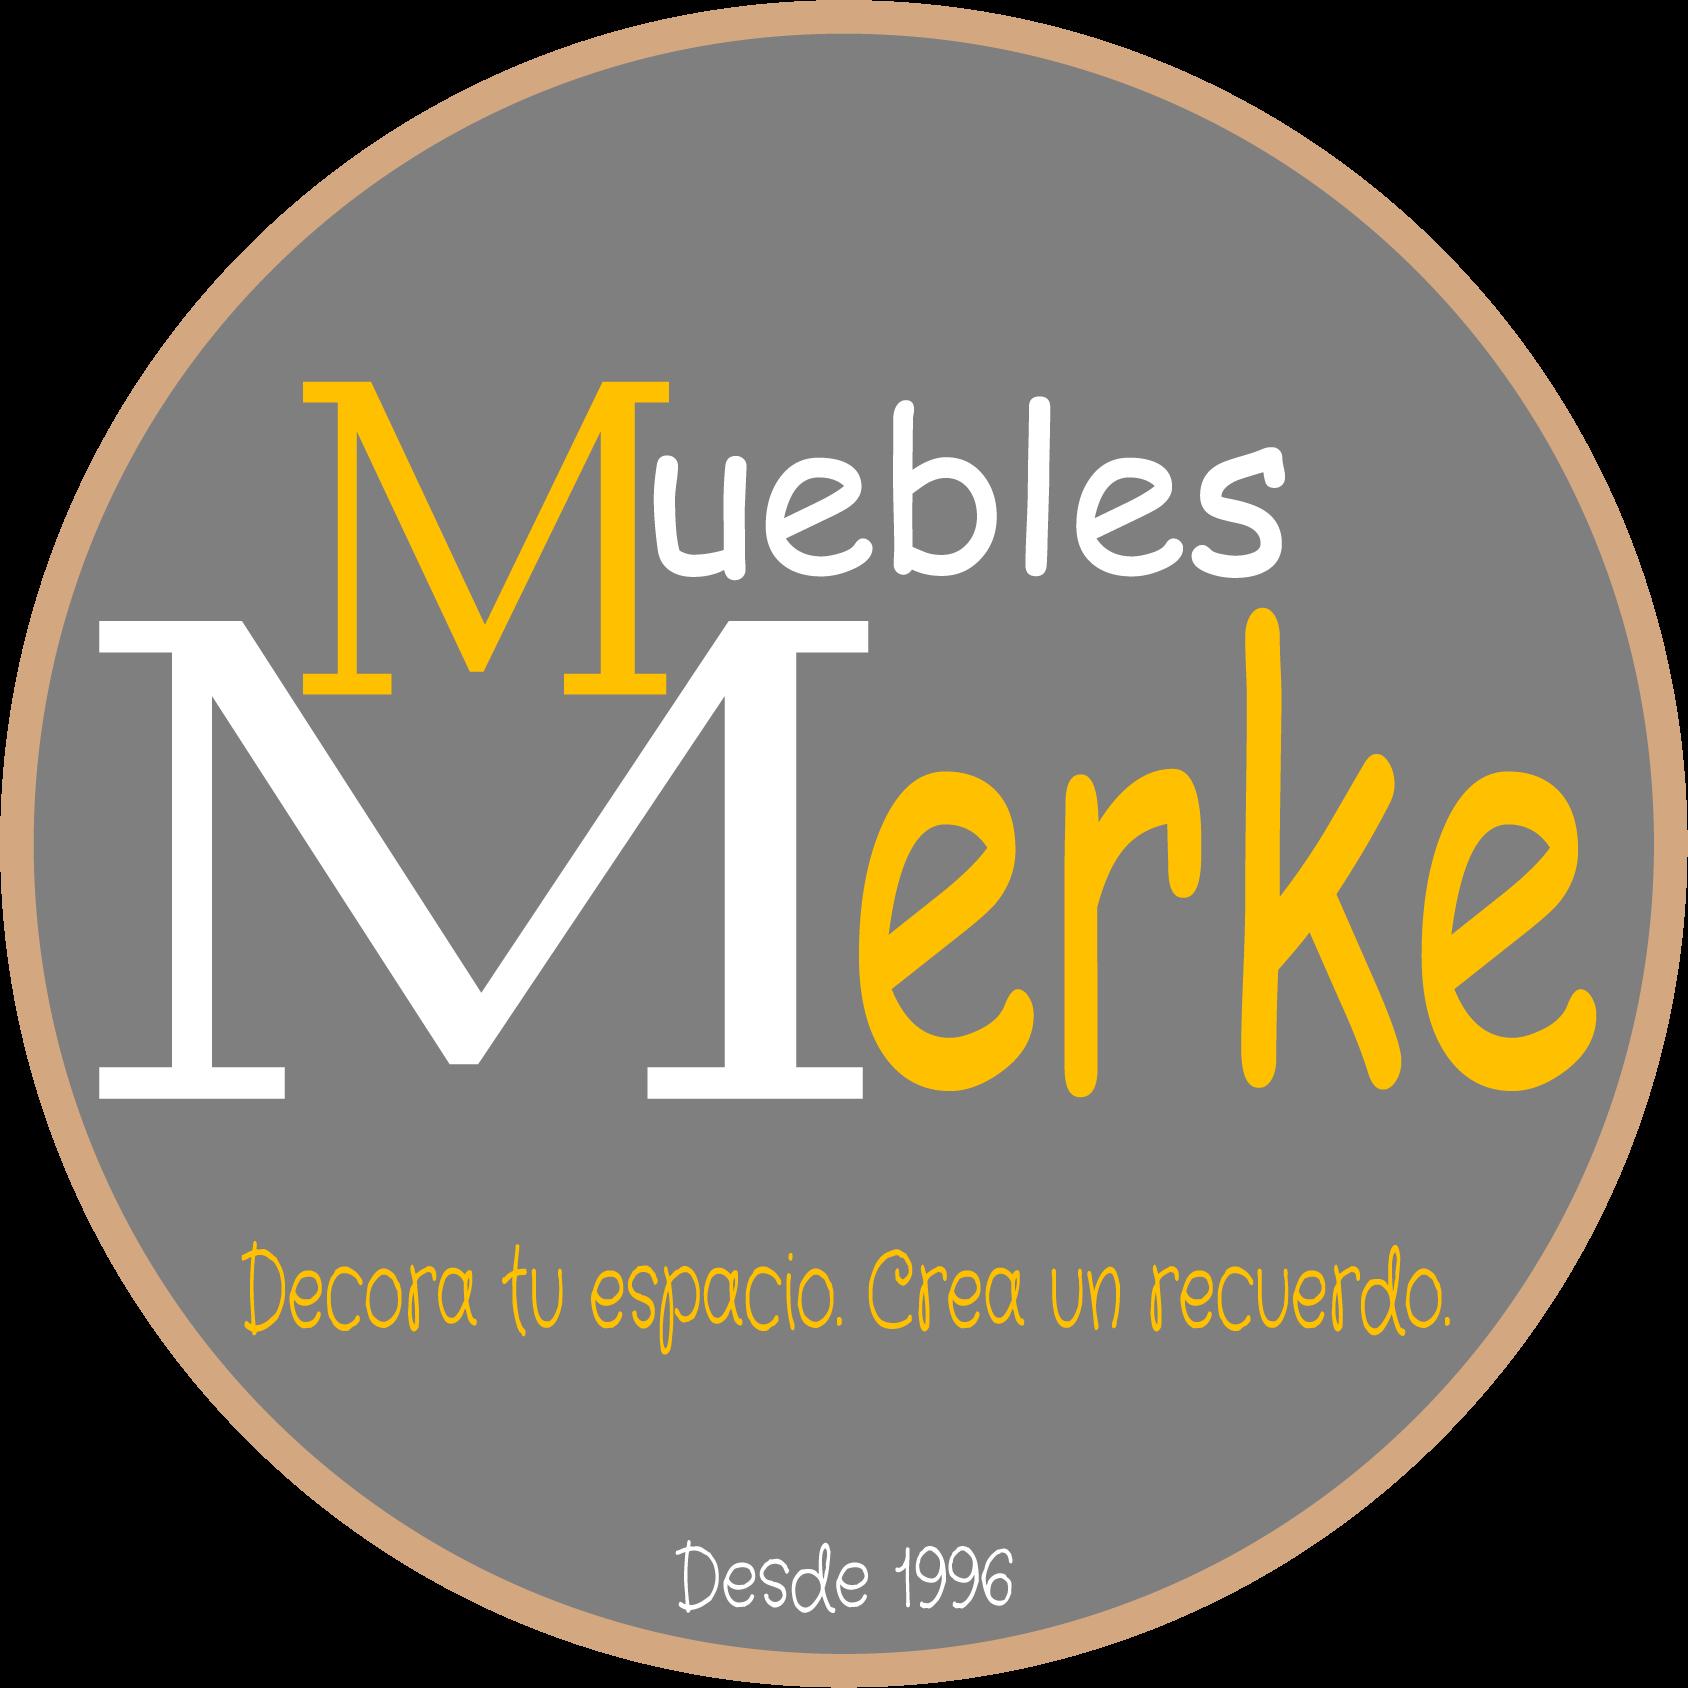 Muebles Merke – Tu tienda de muebles en Vitoria, Muebles a medida.